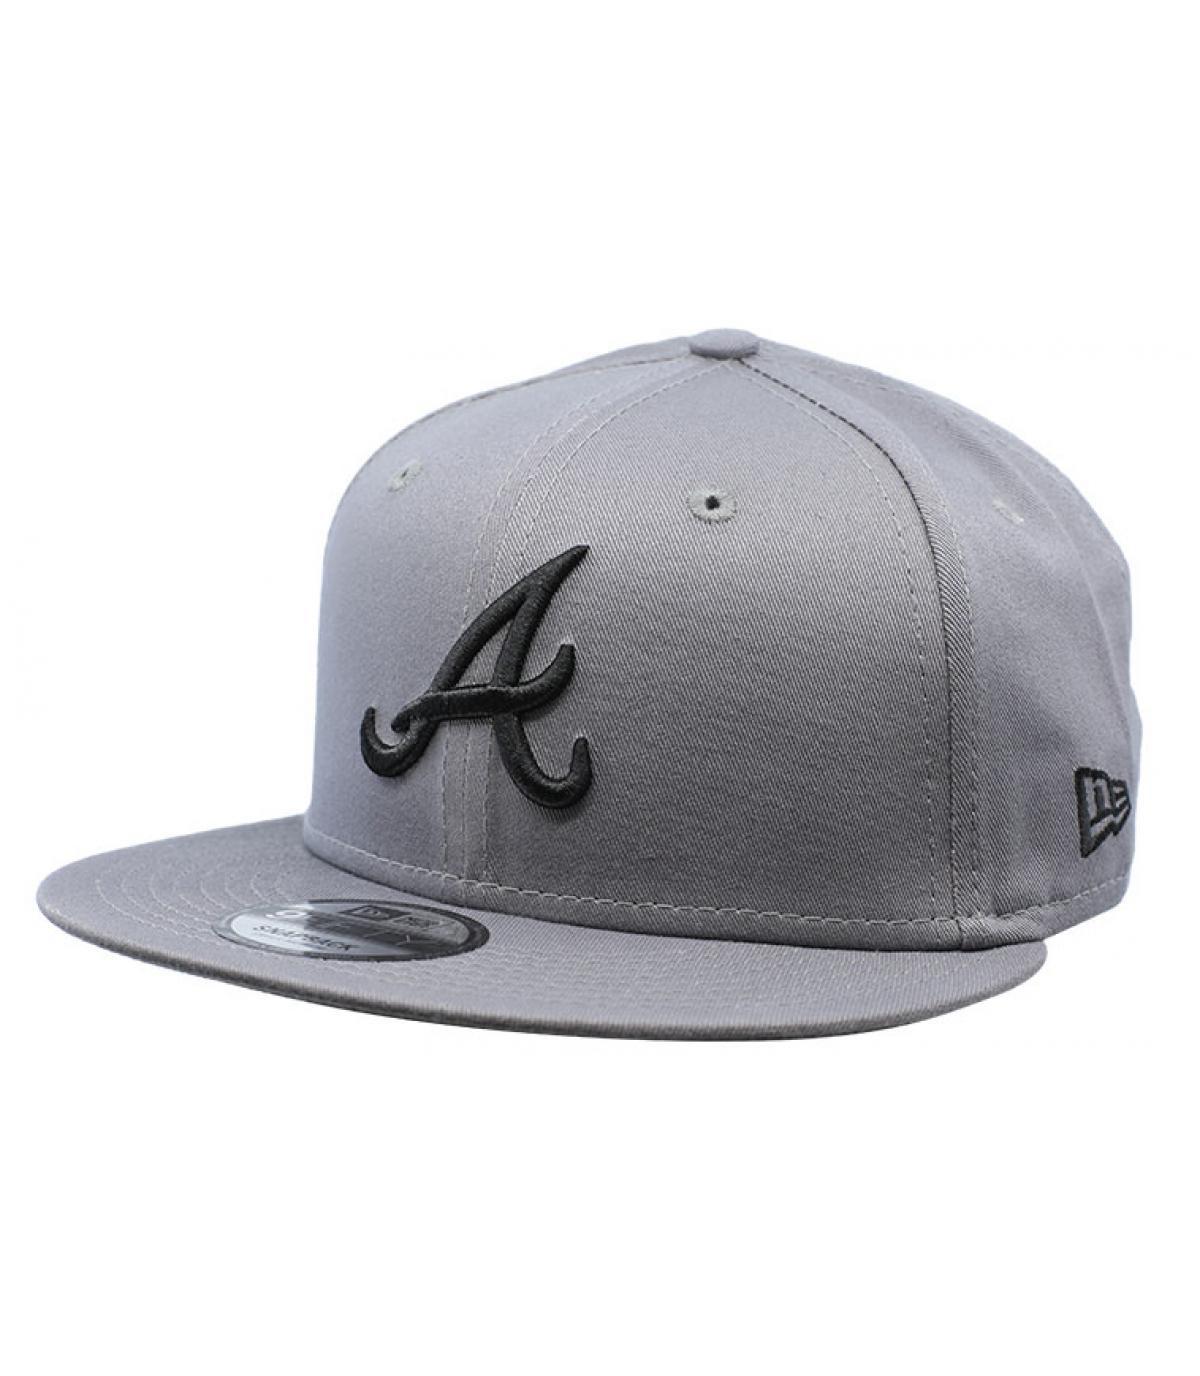 Details League Ess Atlanta 9Fifty gray black - afbeeling 2